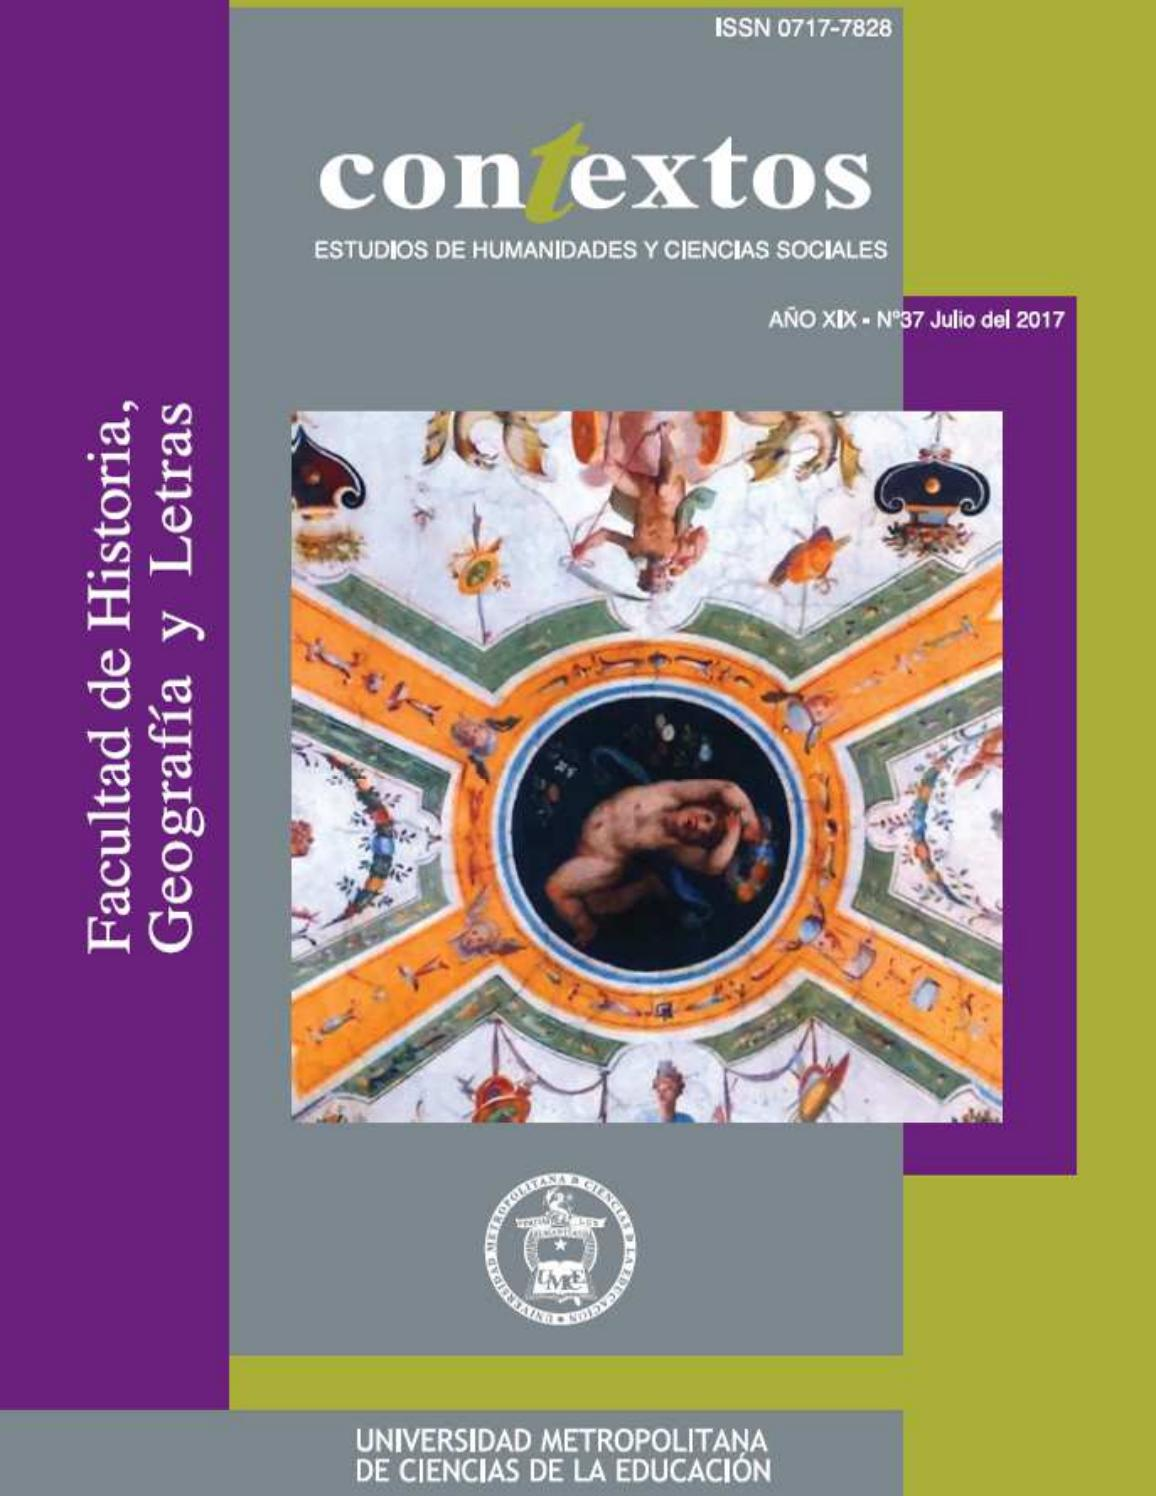 Contextos37 by UMCE - issuu